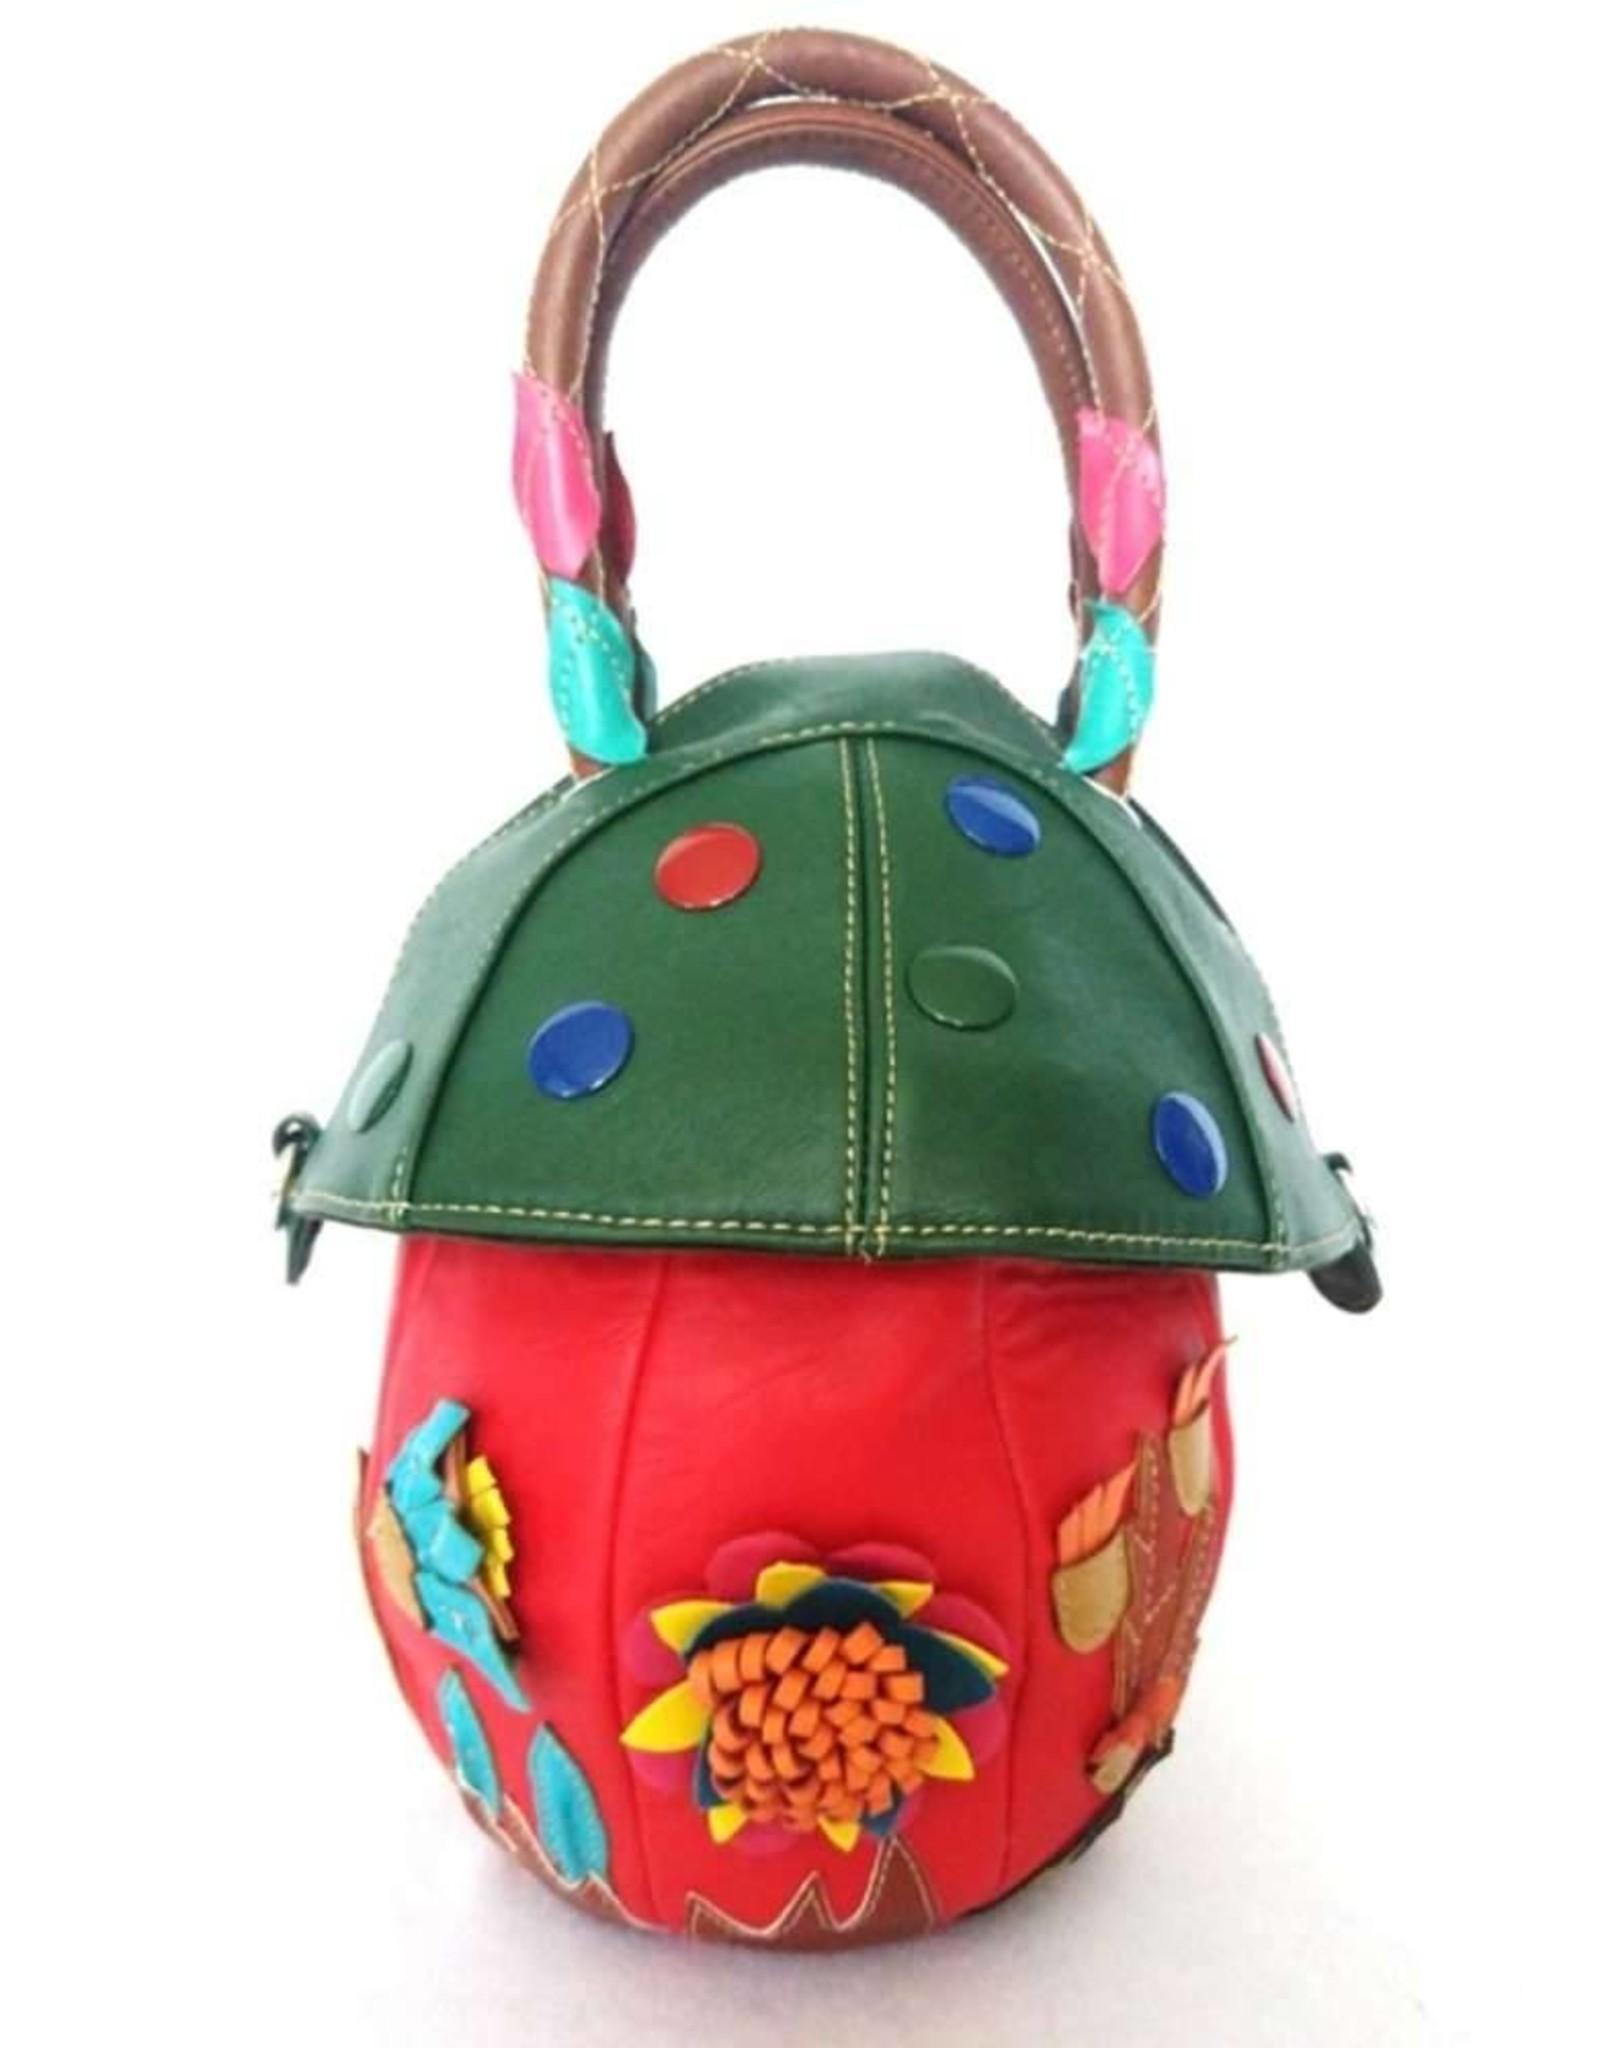 Trukado Fantasy bags - Mushroom bag